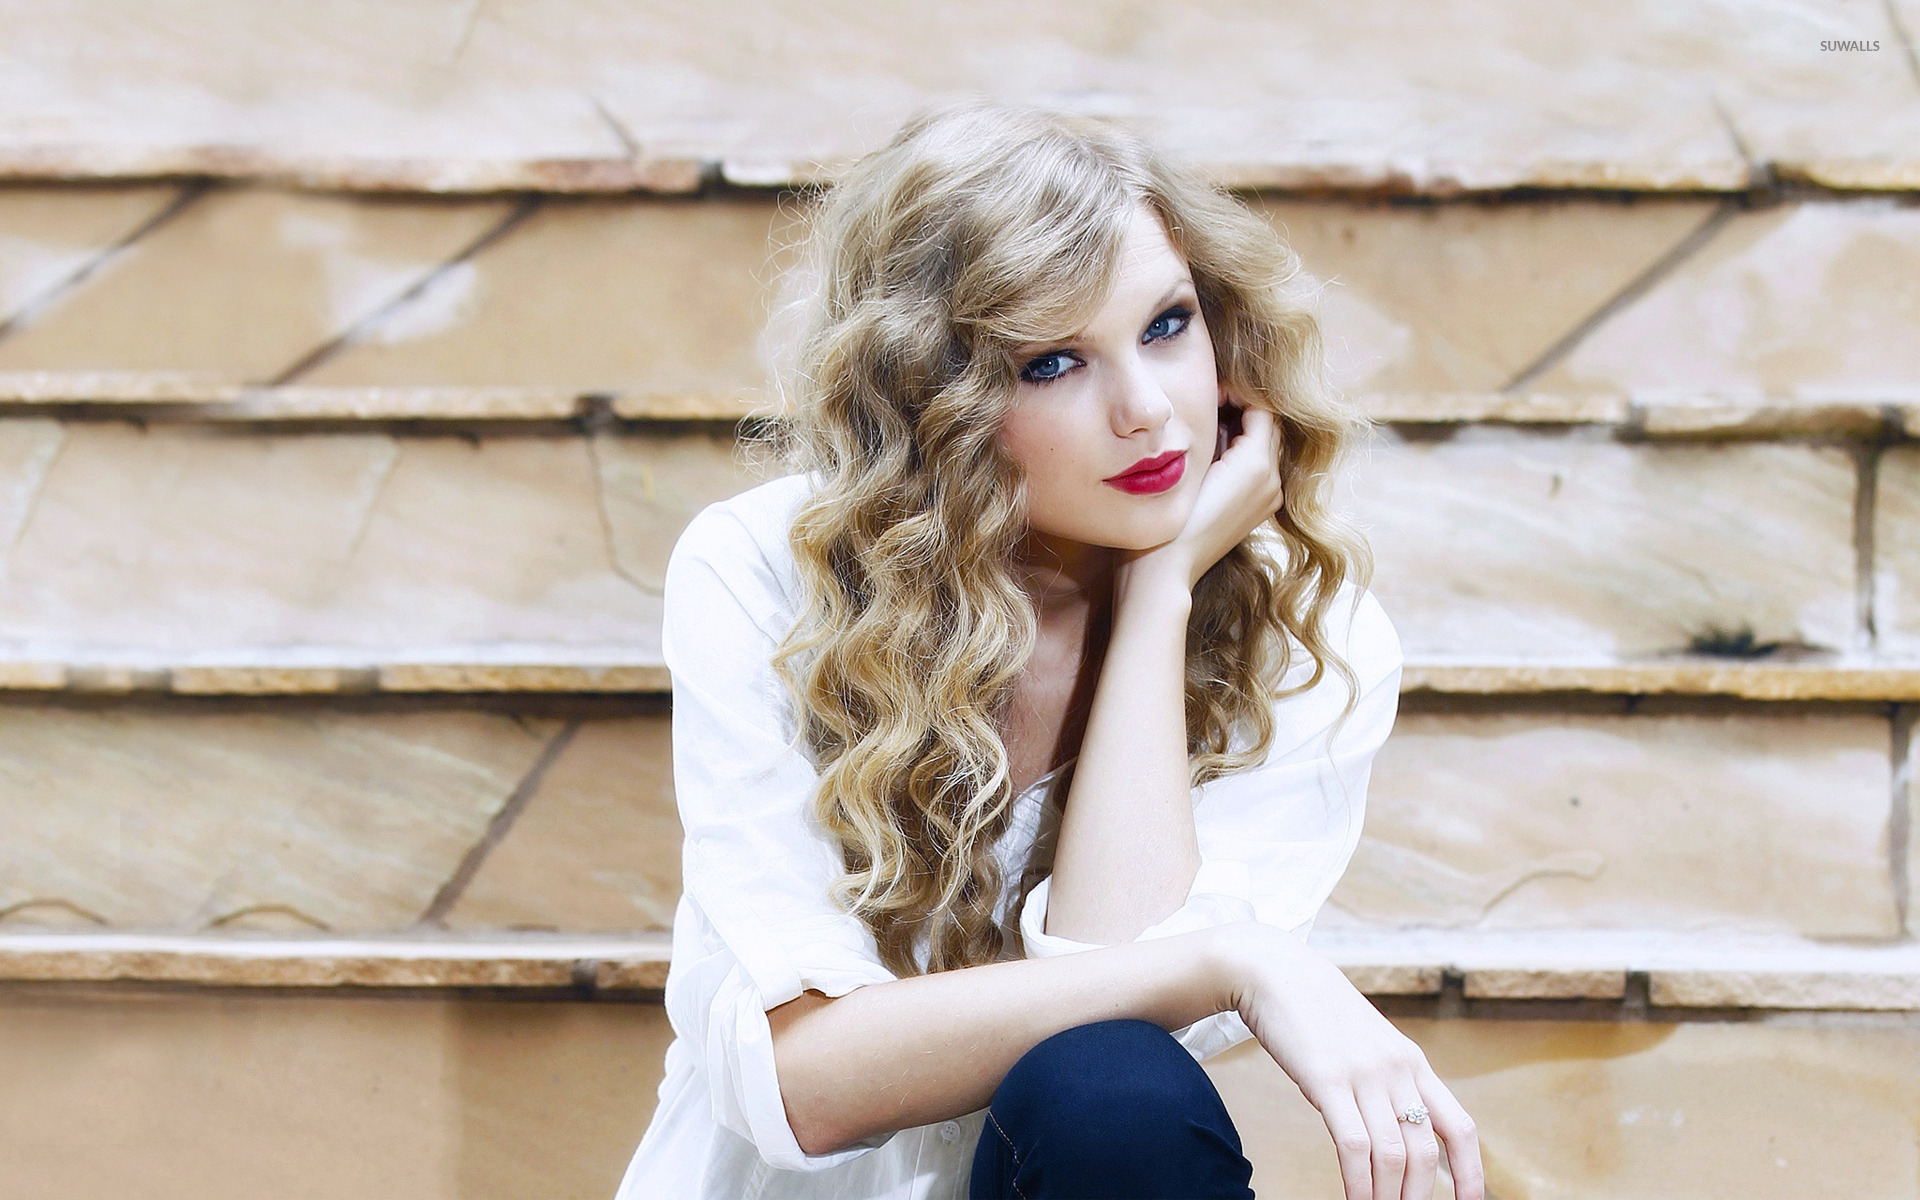 Kpop Girls Desktop Wallpaper Taylor Swift 22 Wallpaper Celebrity Wallpapers 12721